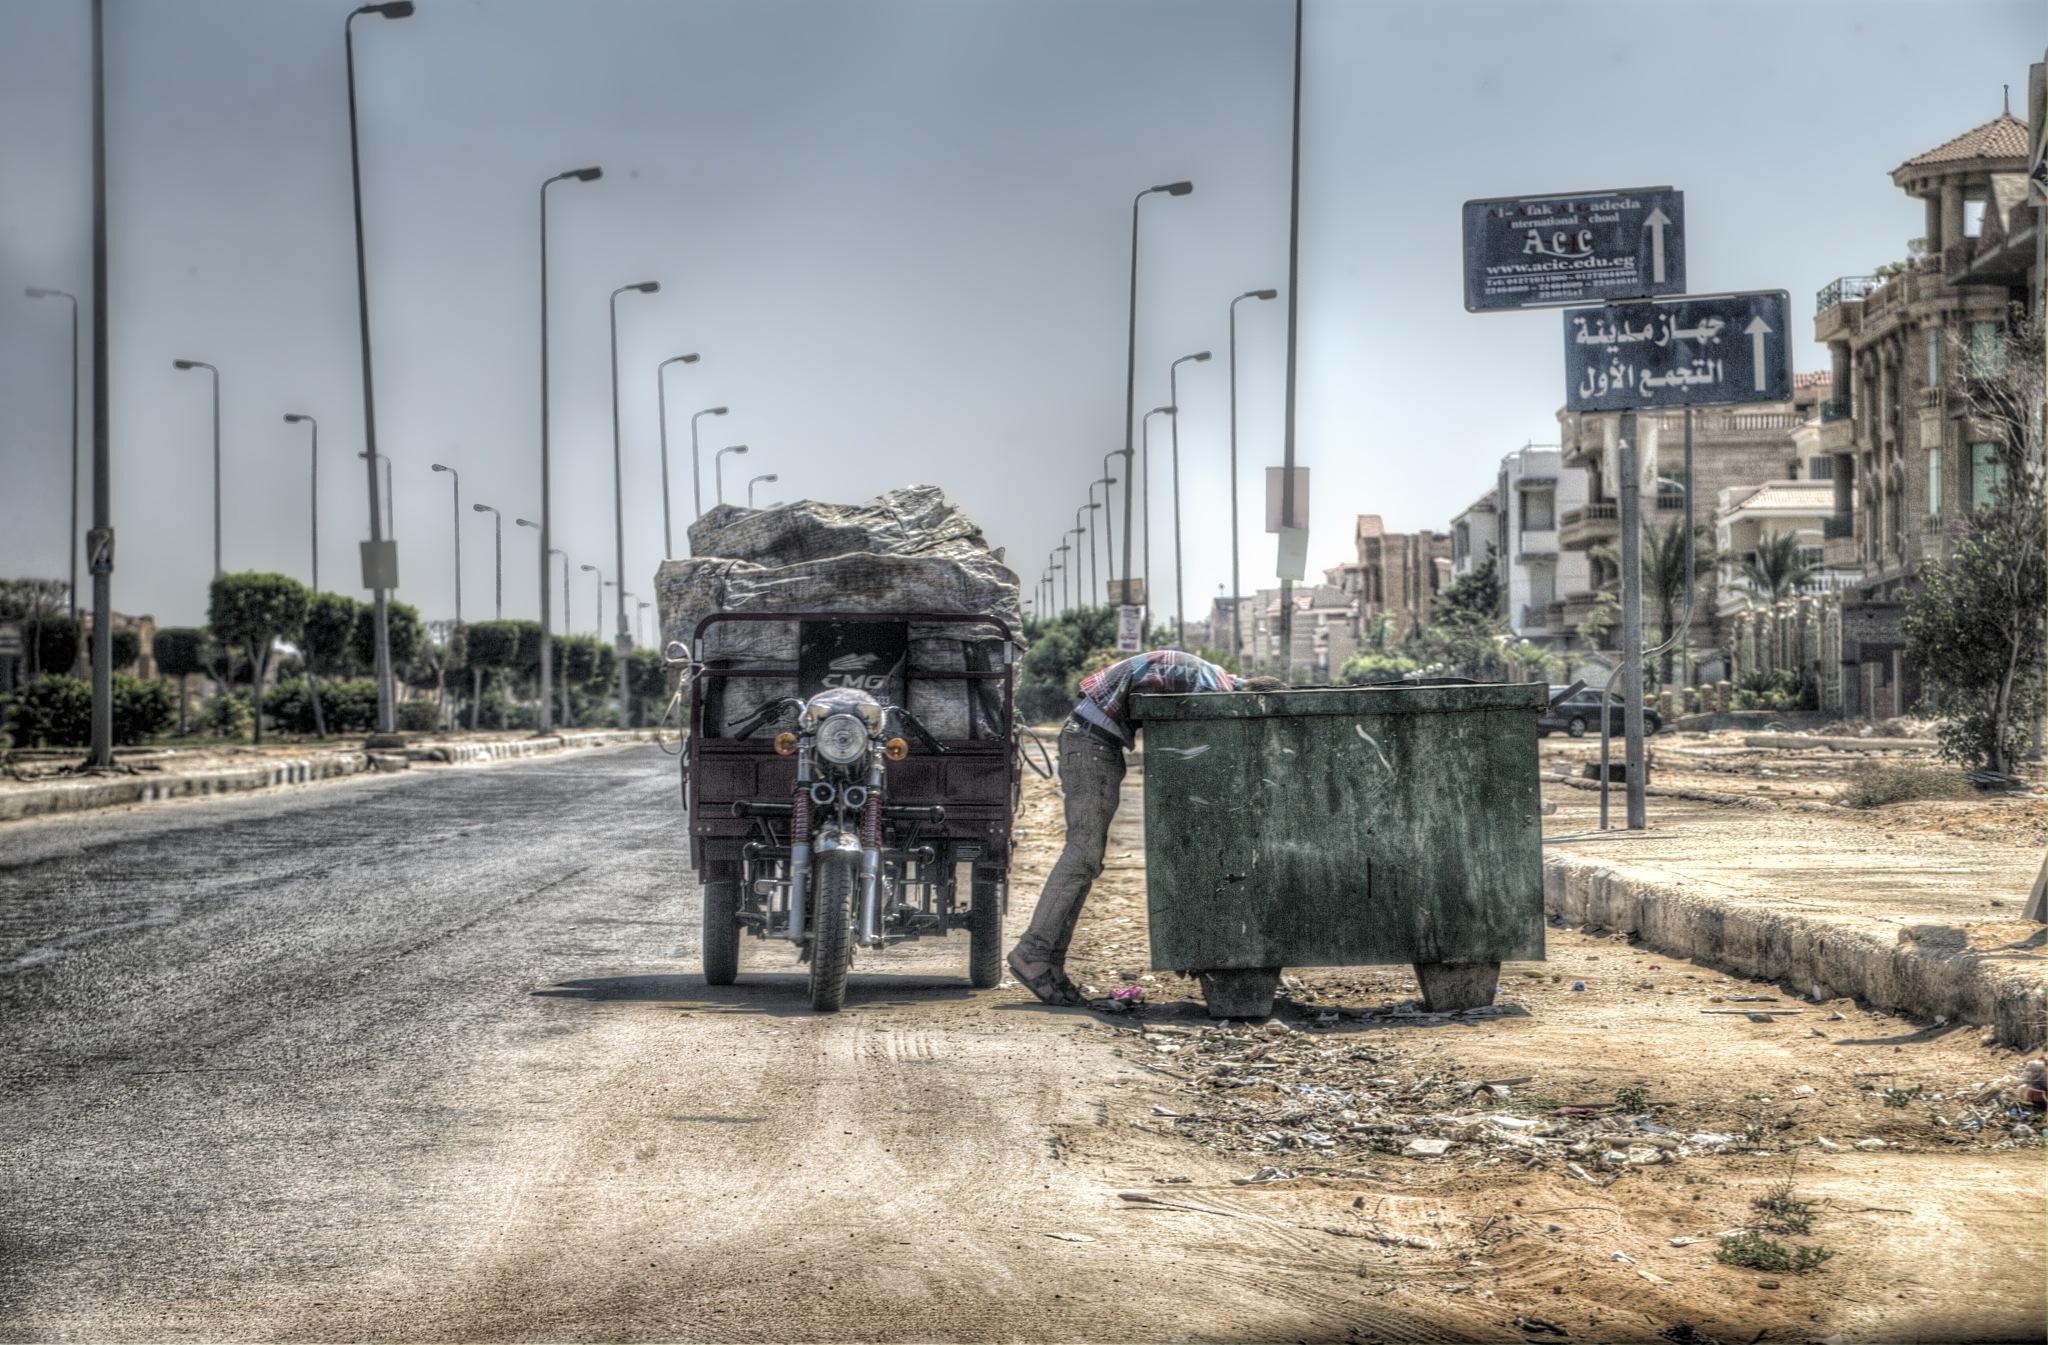 Trash Collector by Tawfik W Dajani